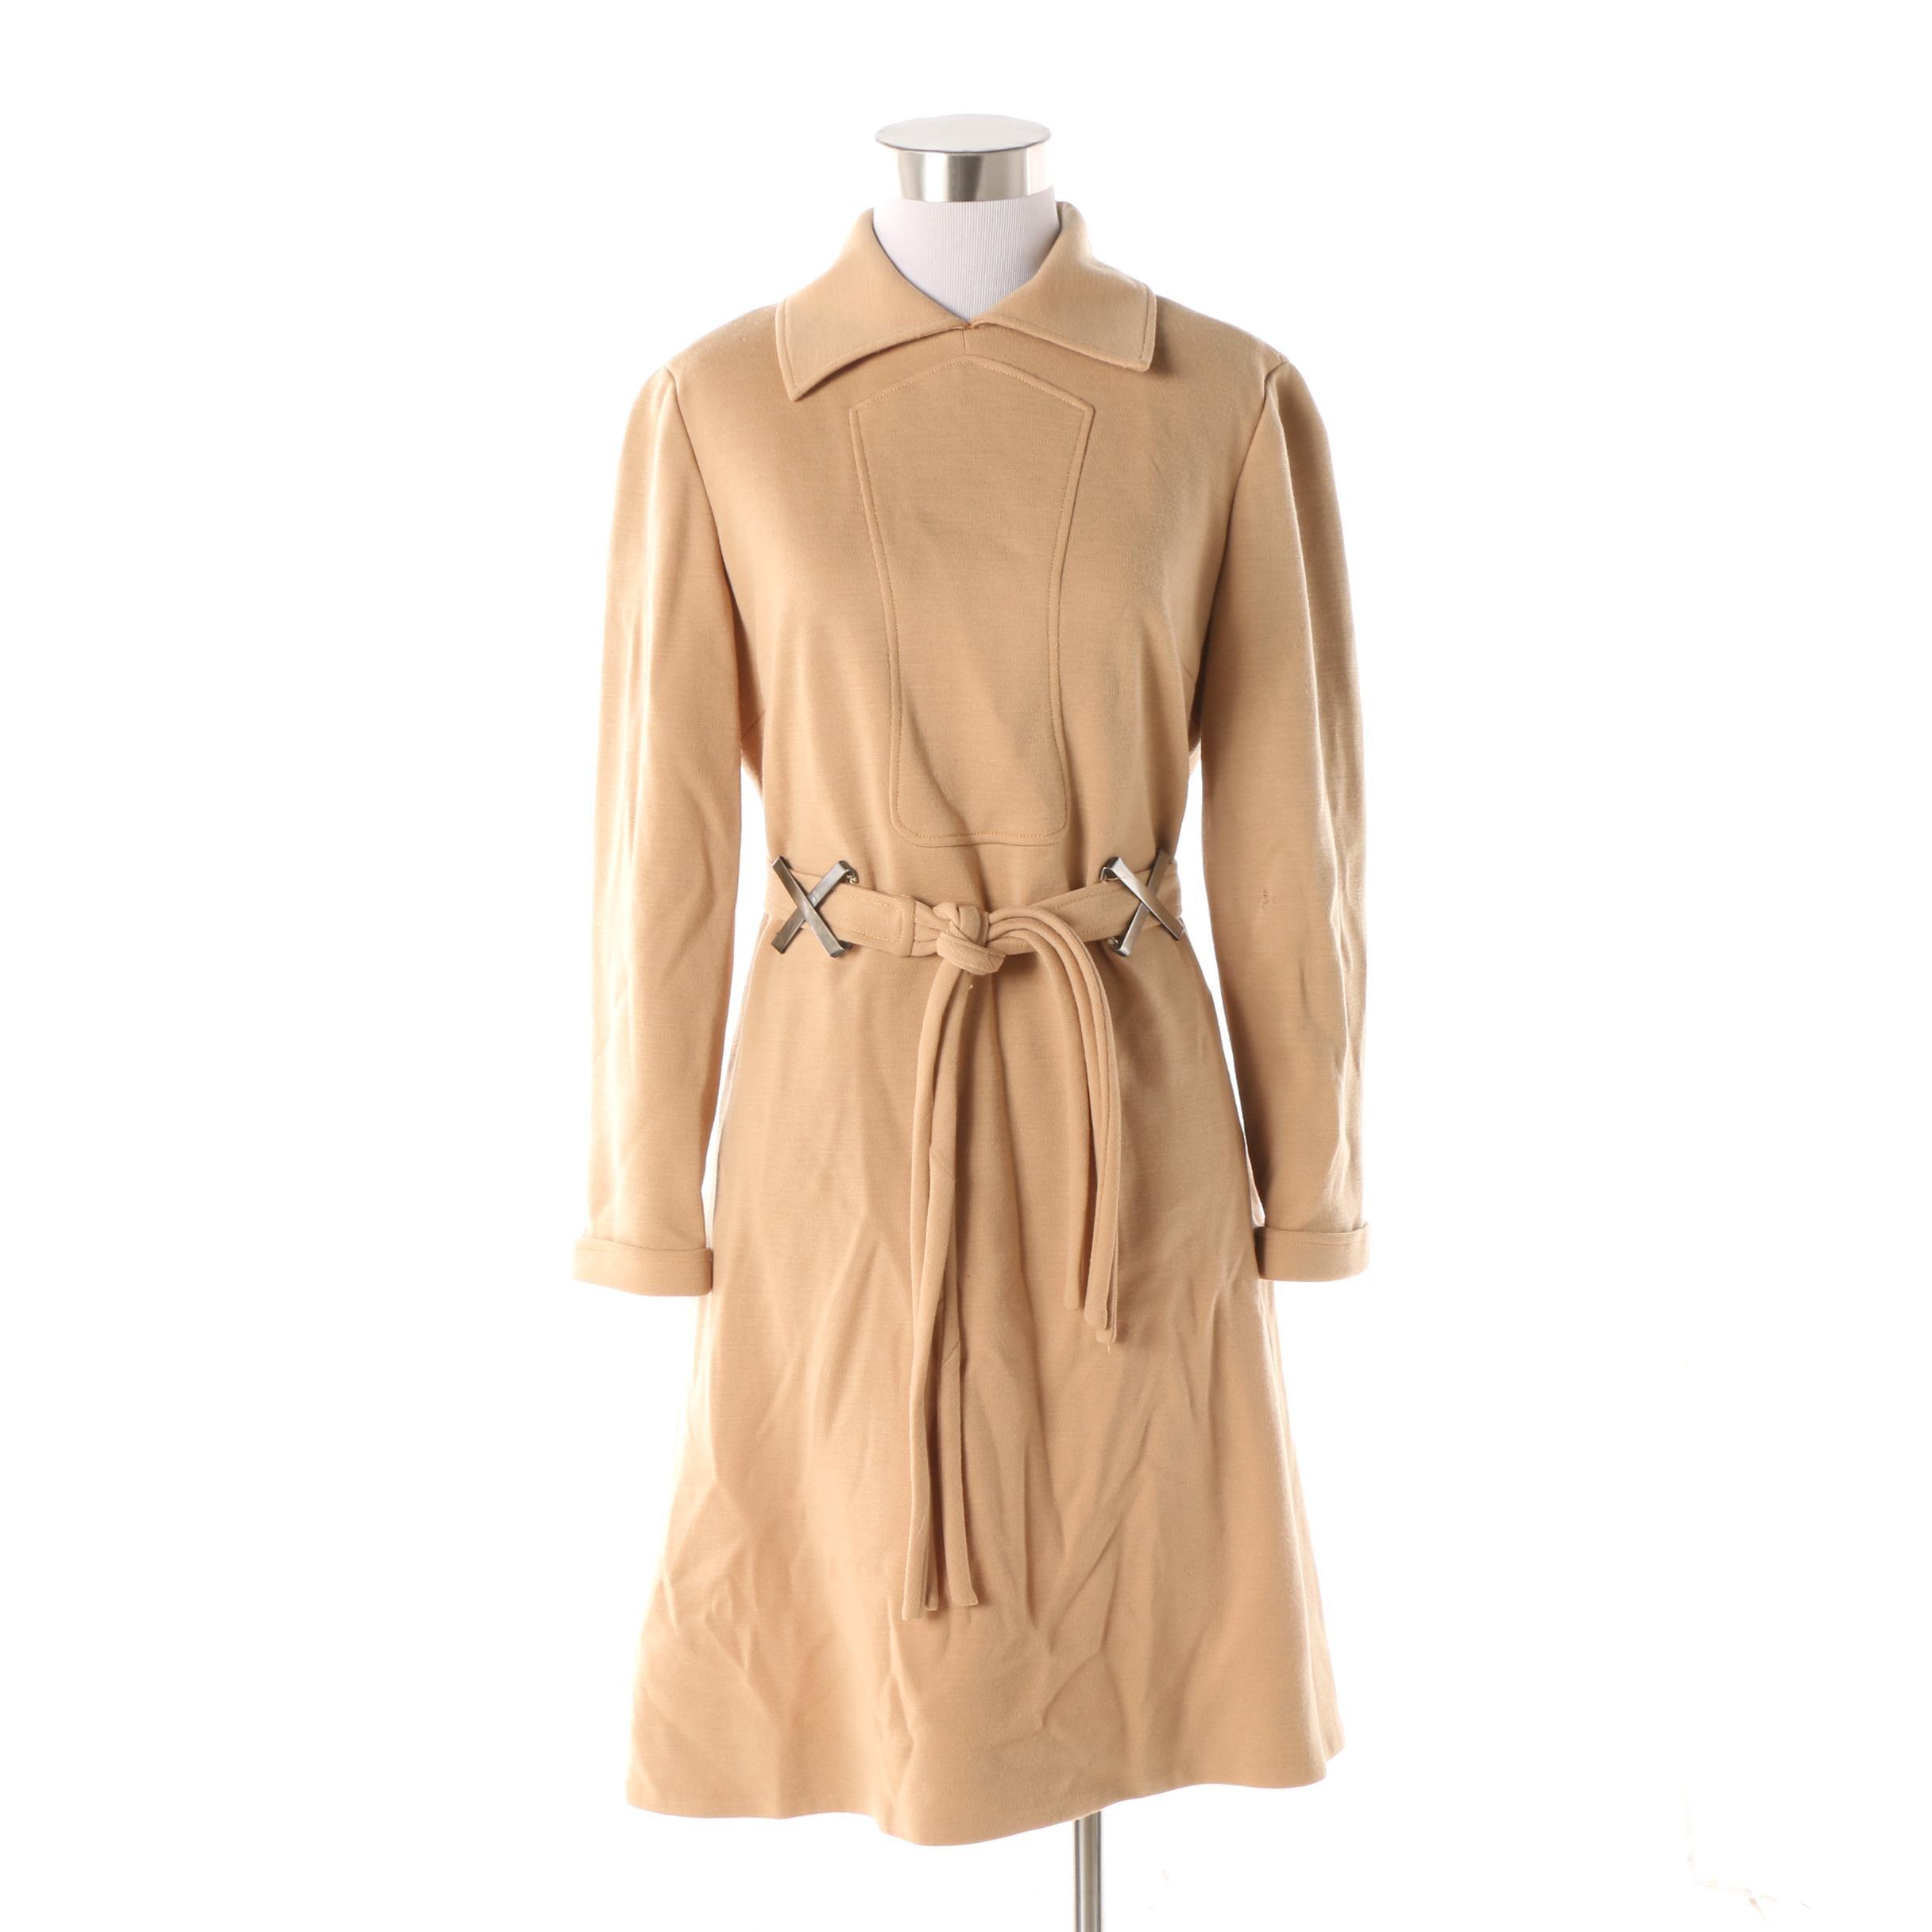 Women's Vintage Louis Féraud for Saks Fifth Avenue Tan Knit Shirt Dress